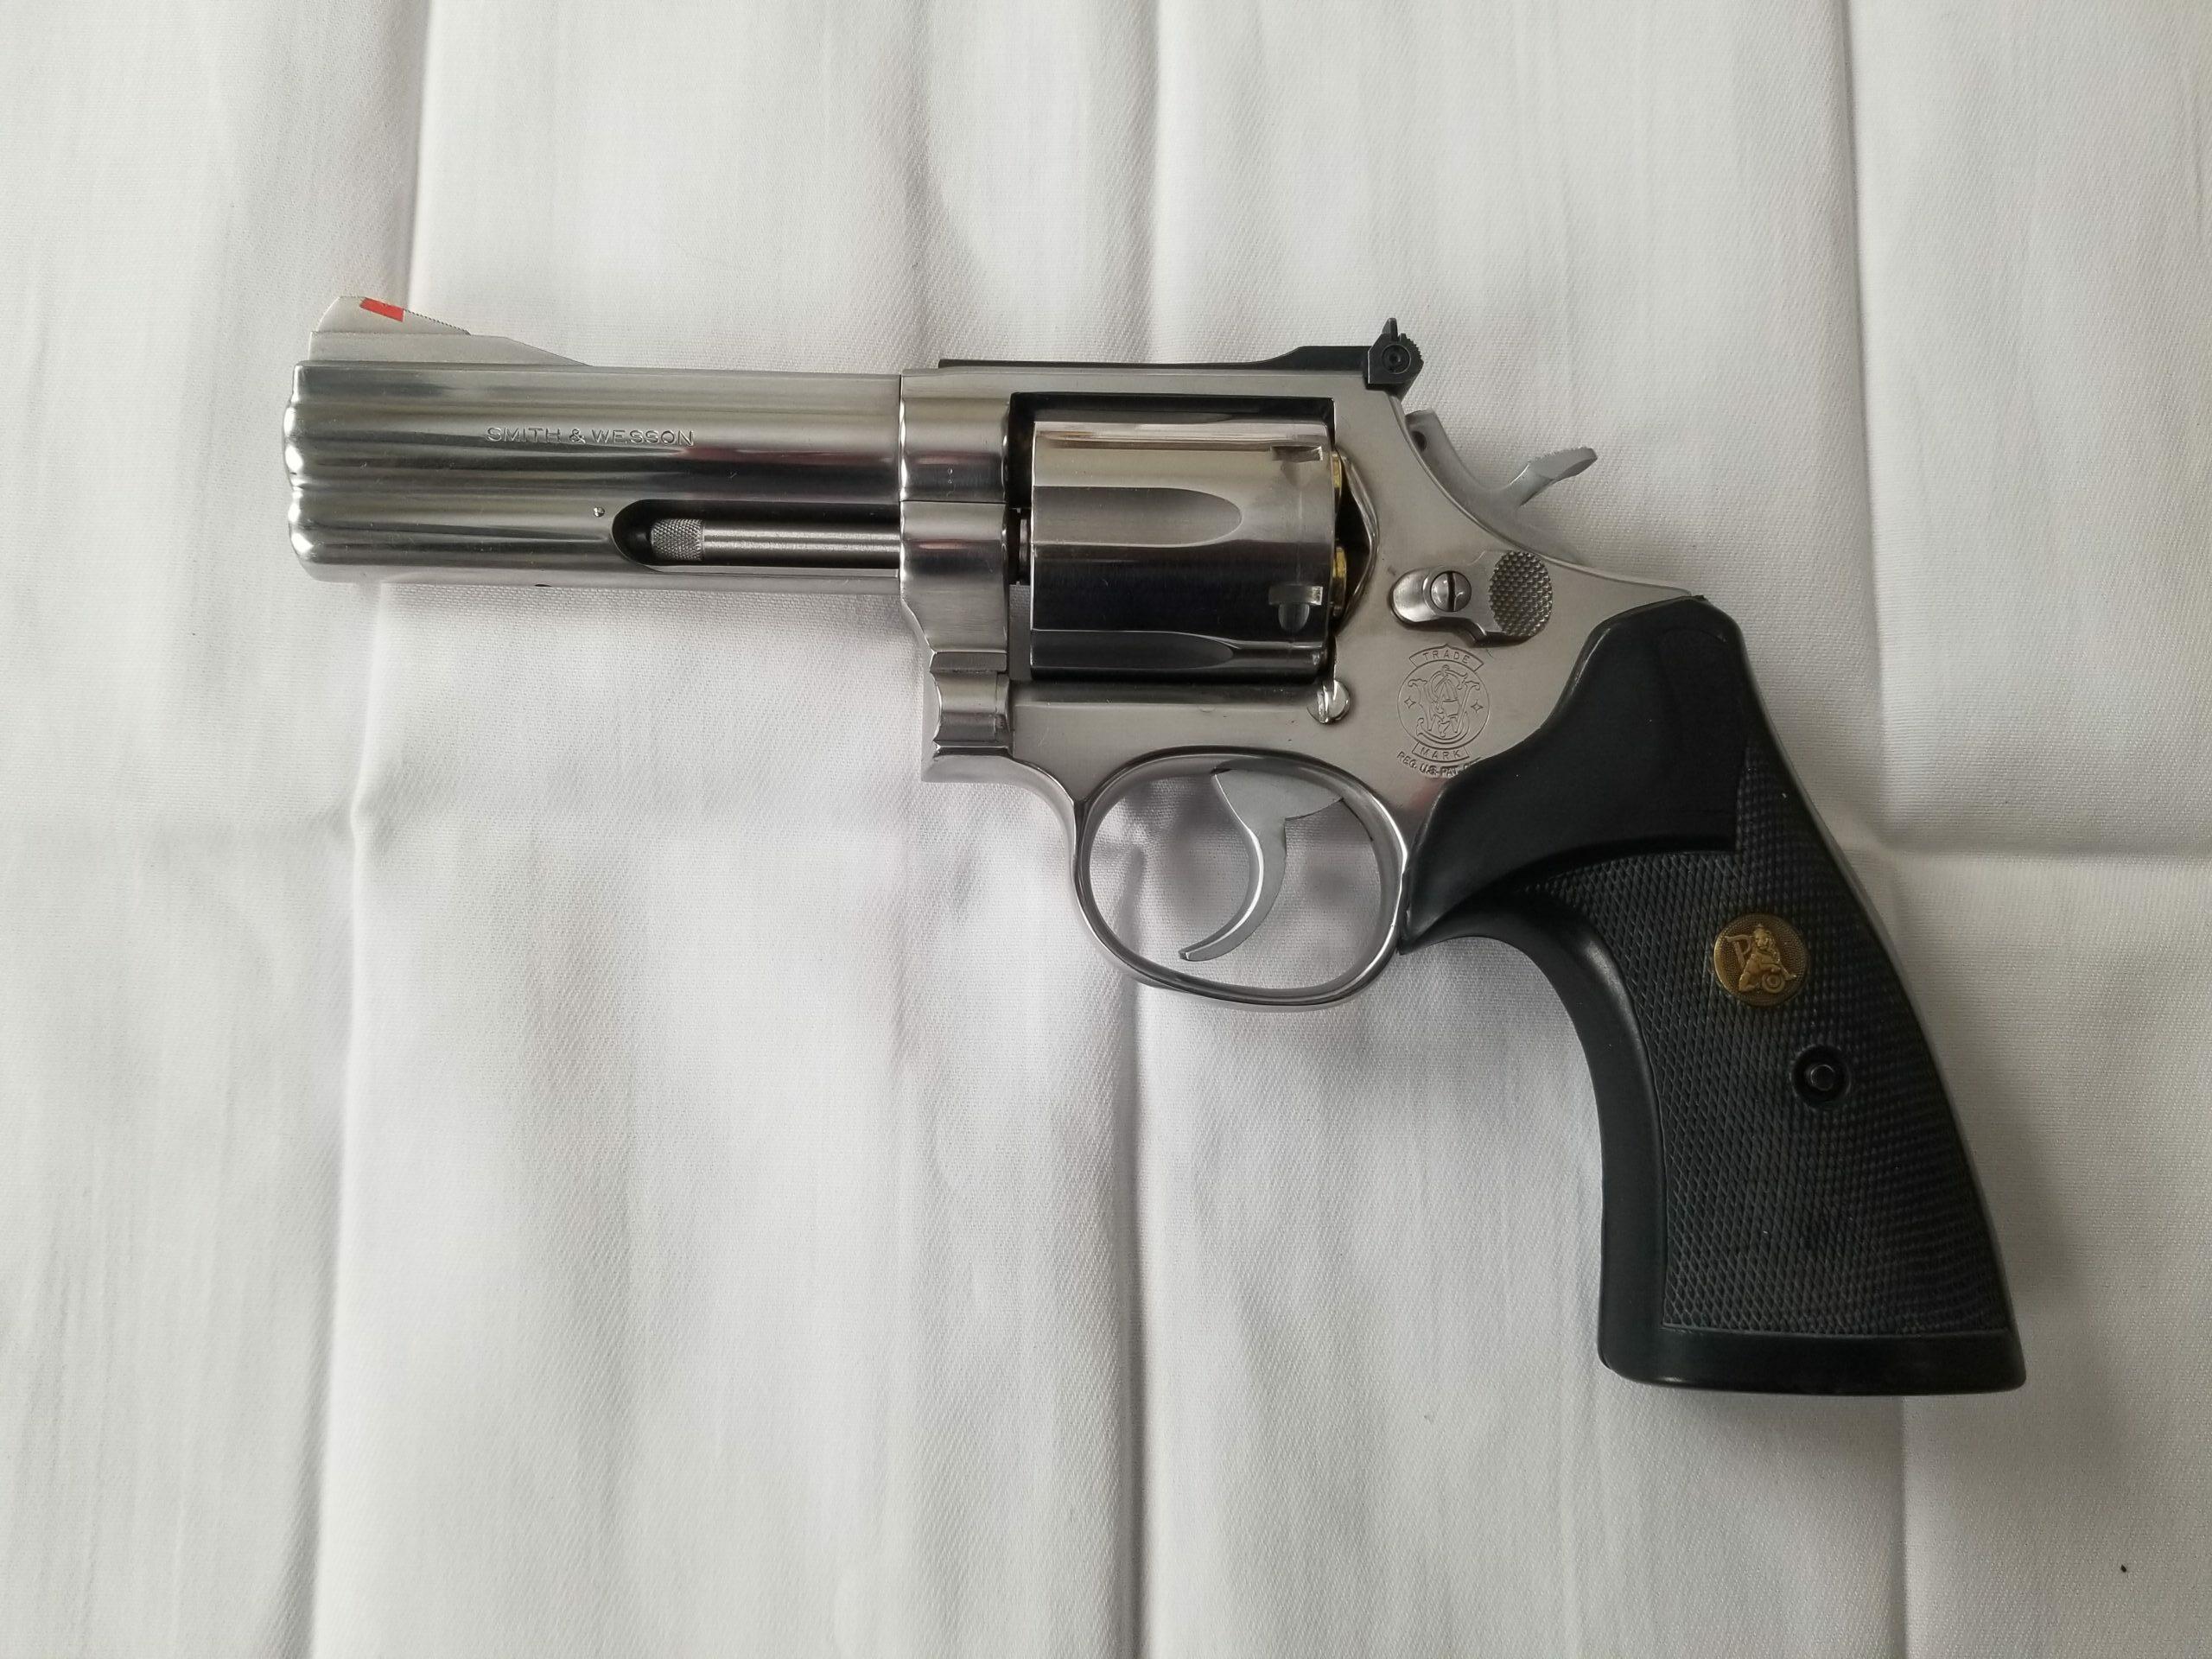 Smith & Wesson Model 686 .357 Magnum Revolver